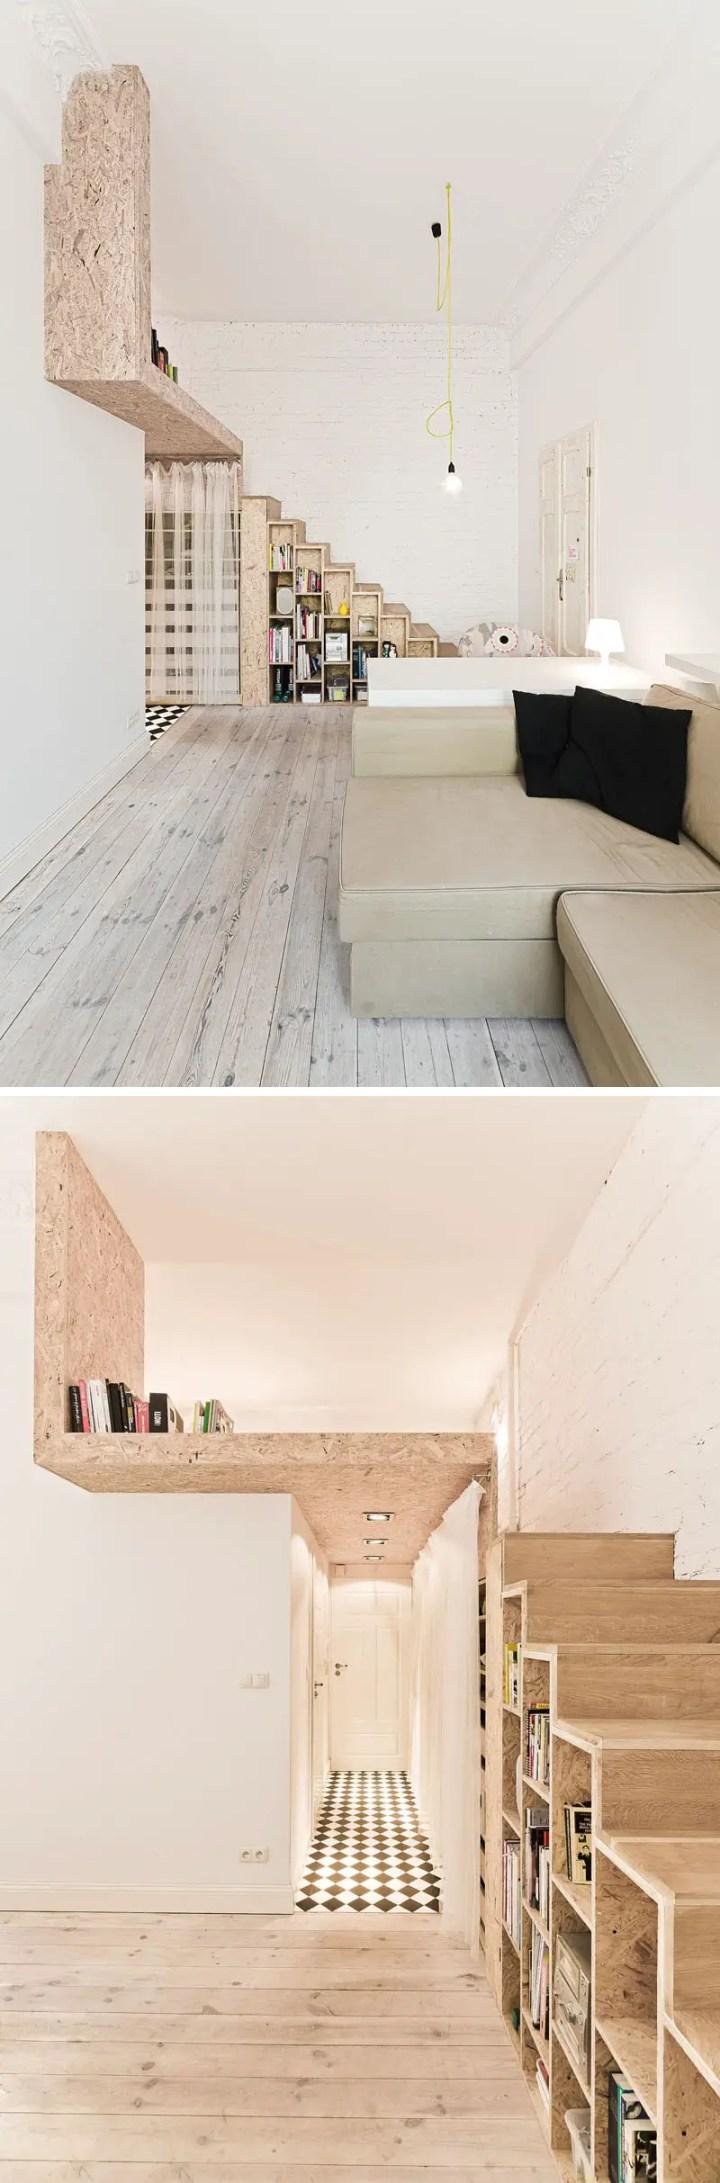 amenajarea unui apartament de 29 de metri patrati Smart design on just 29 square meters 6